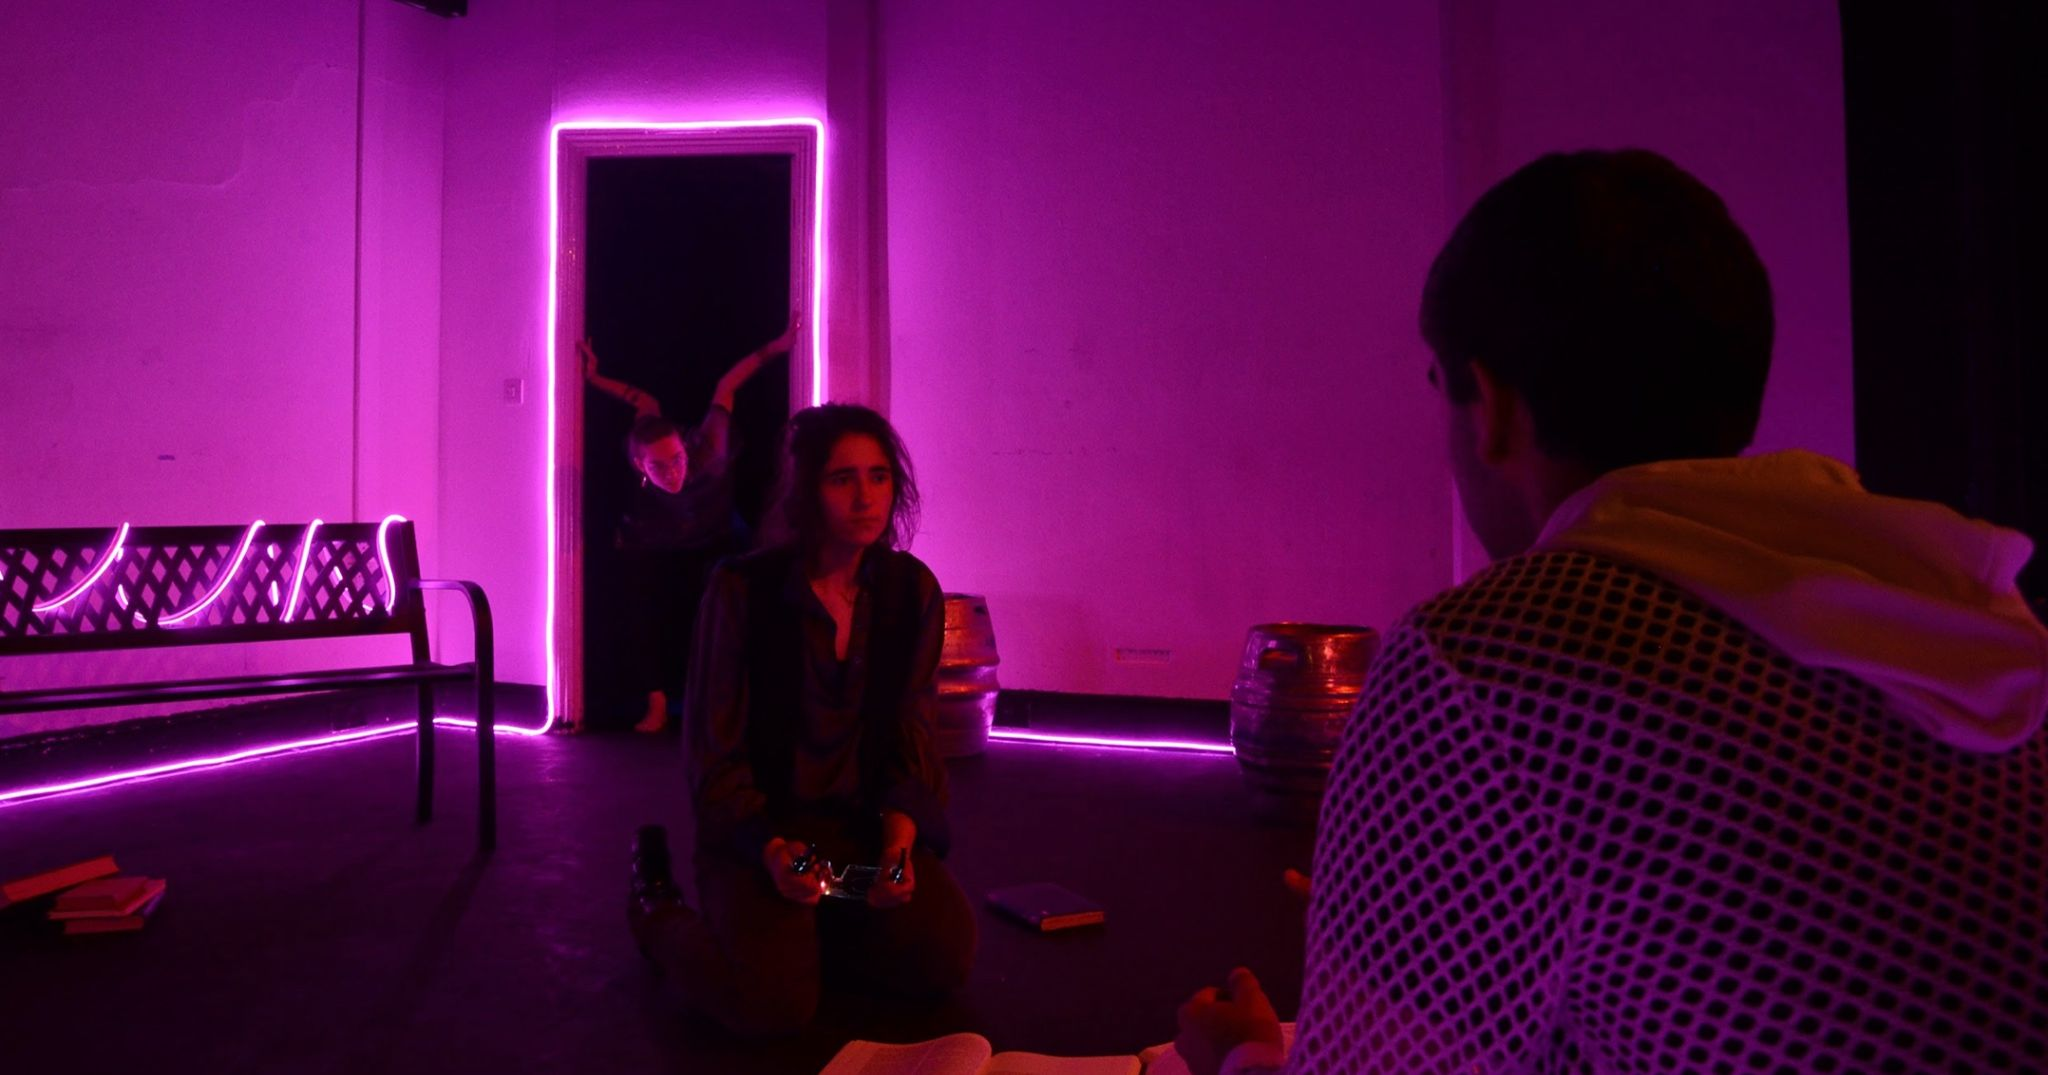 Image may contain: Light, Club, Bar Counter, Pub, Lighting, Interior Design, Indoors, Night Life, Human, Person